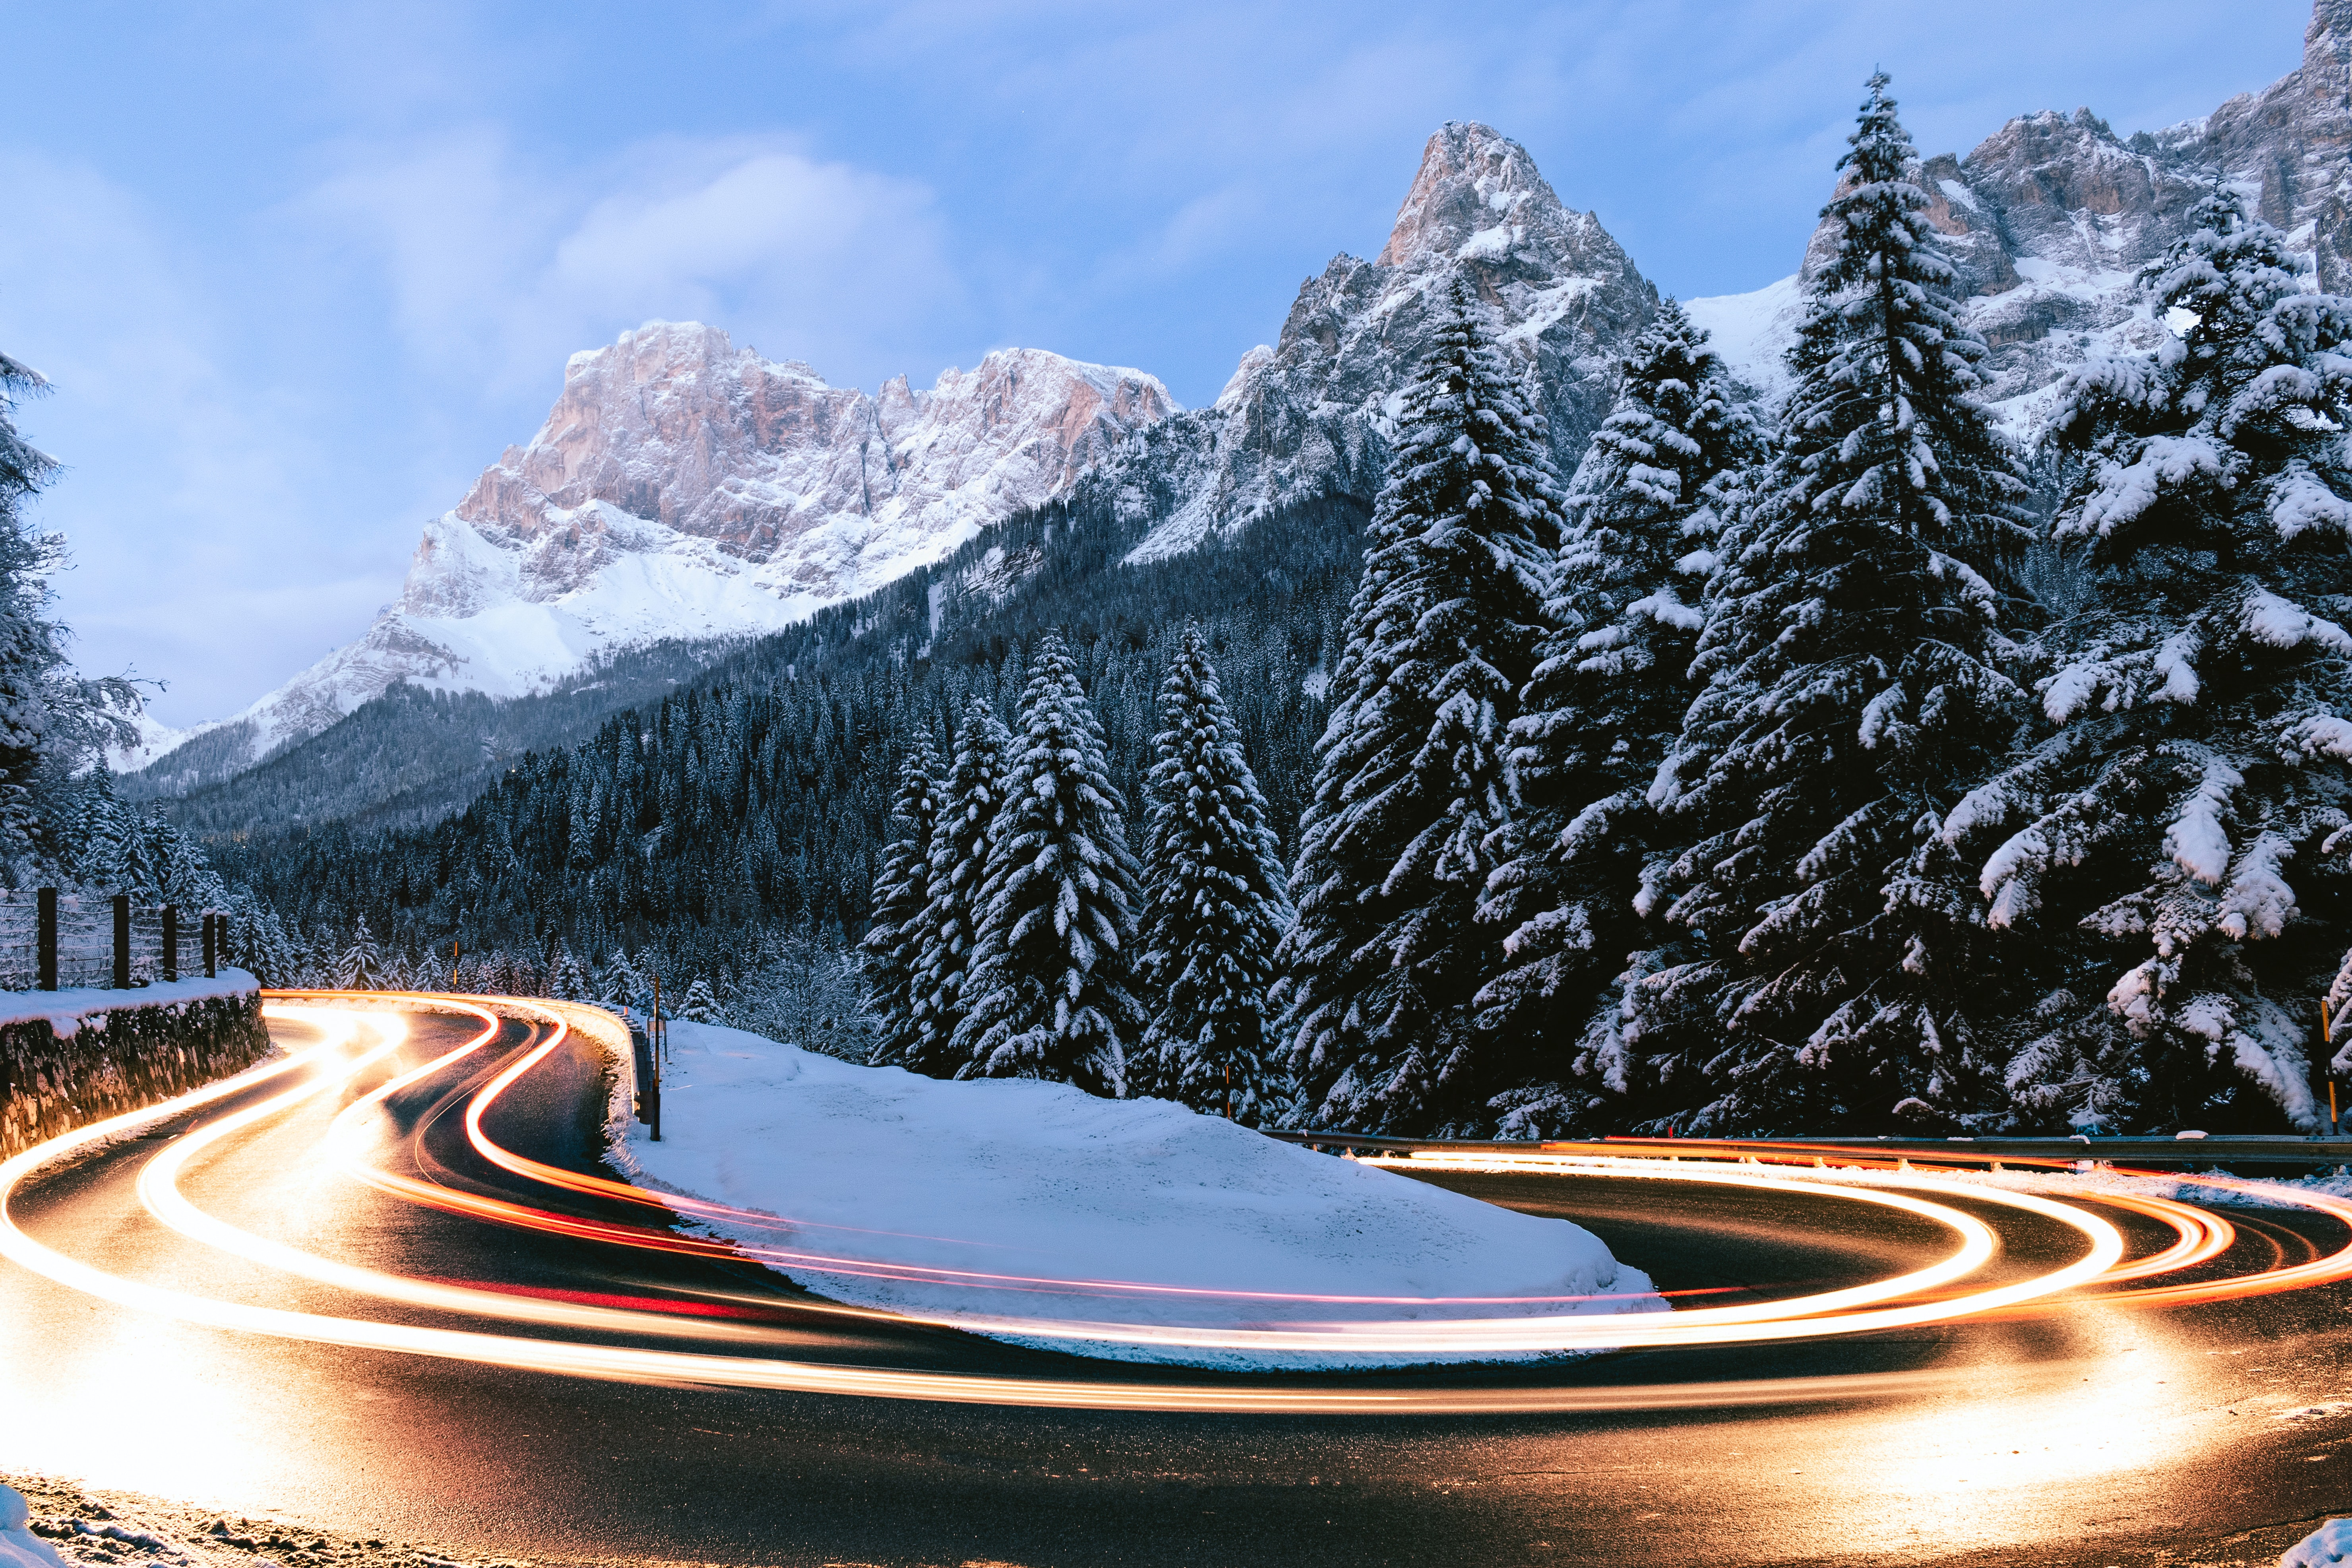 long exposure road timelapse winter 4k 1602504082 - Long Exposure Road Timelapse Winter 4k - Long Exposure Road Timelapse Winter 4k wallpapers